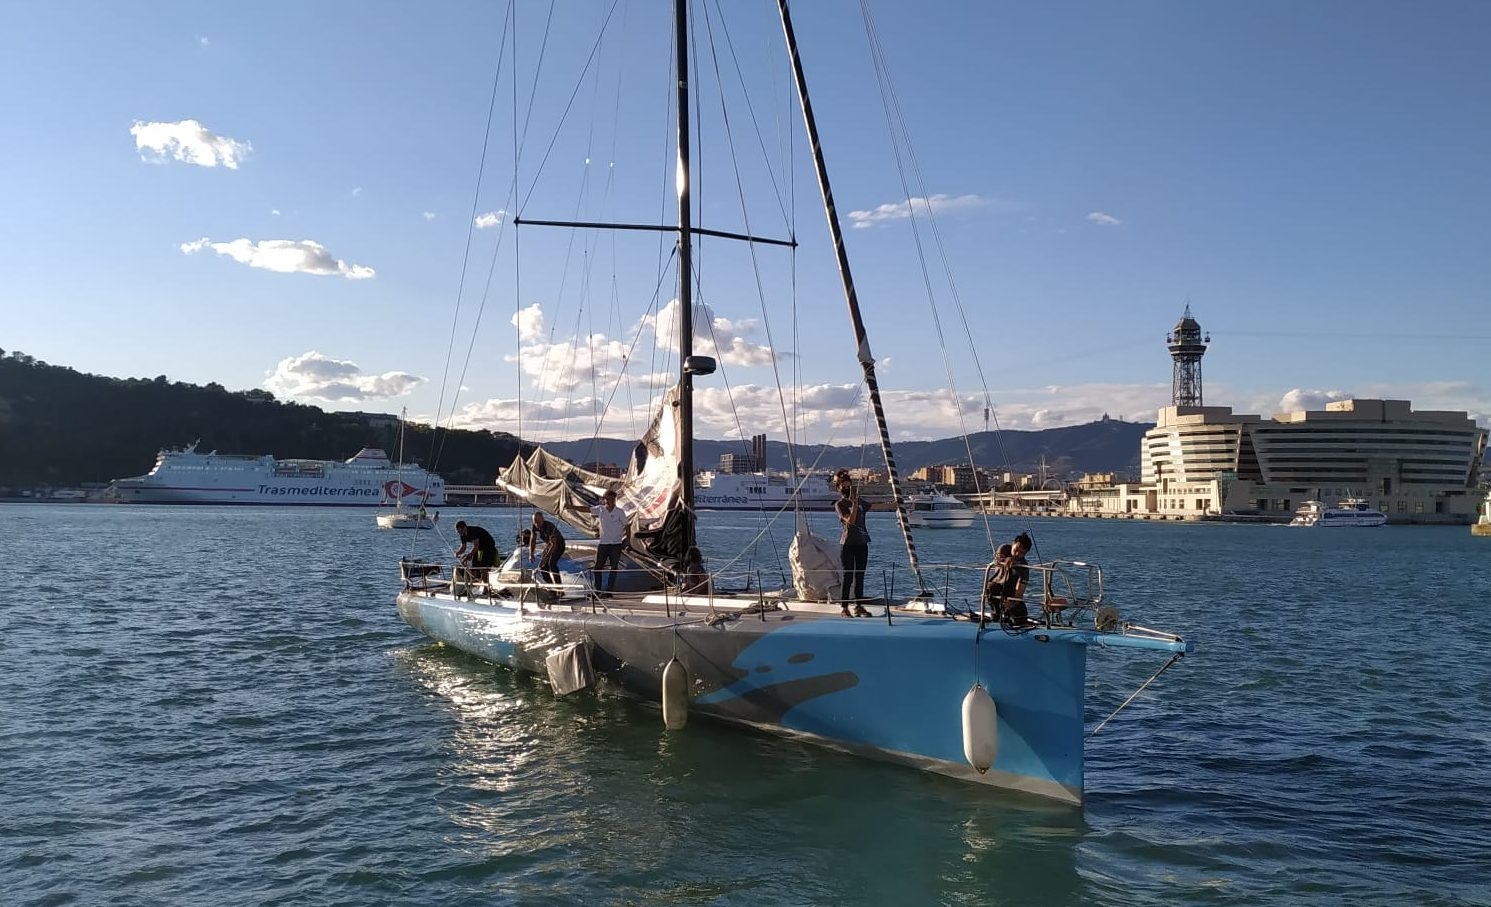 Didac Costa zarpa desde Barcelona rumbo a la Vendée Globe